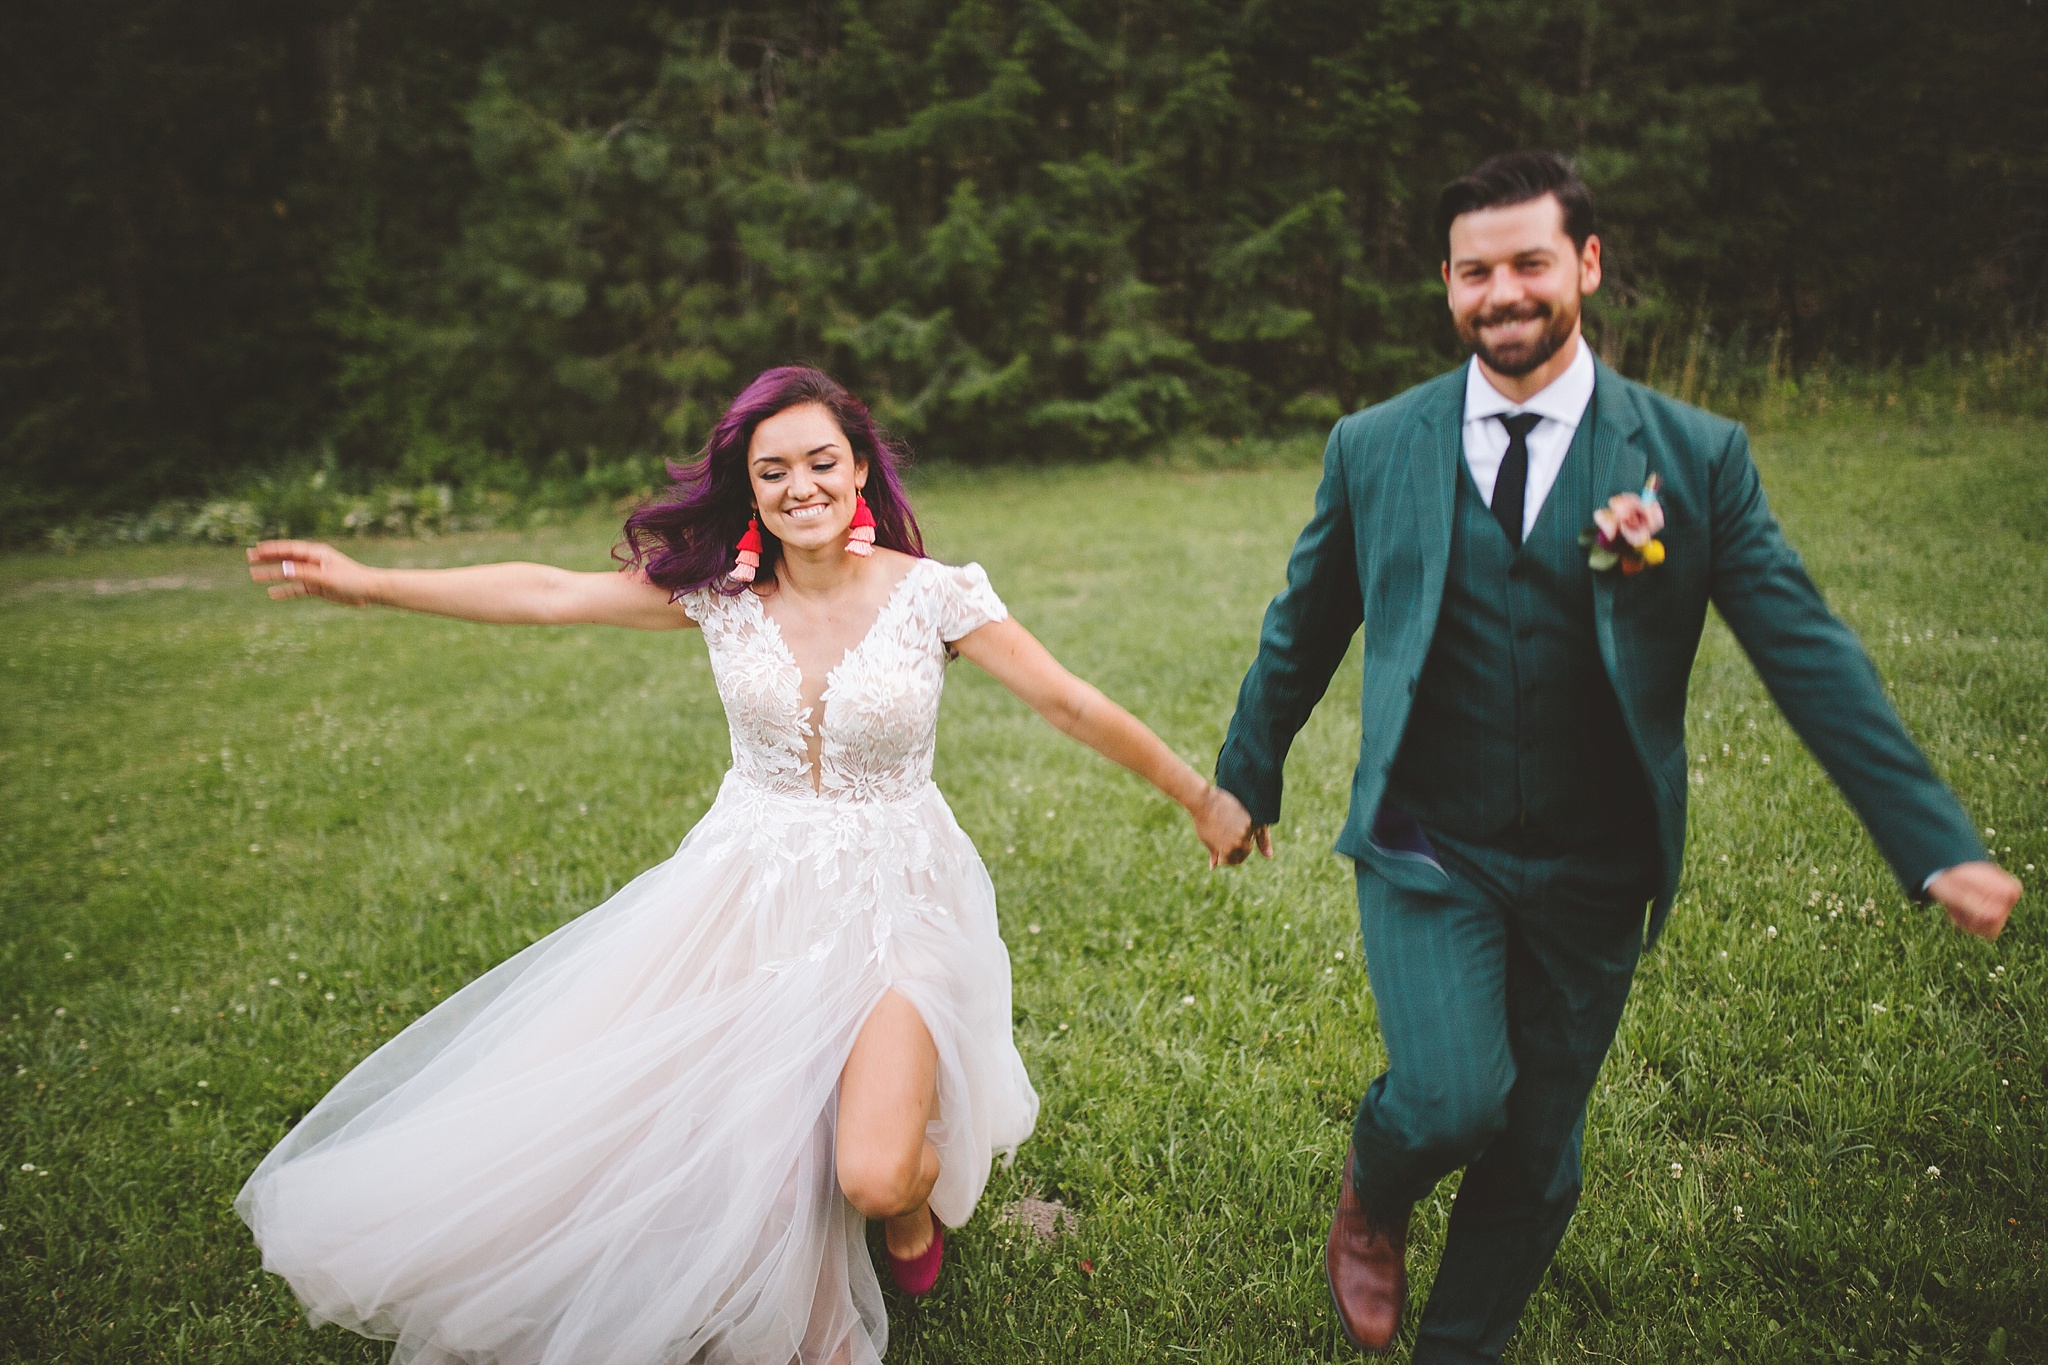 running through the woods on wedding